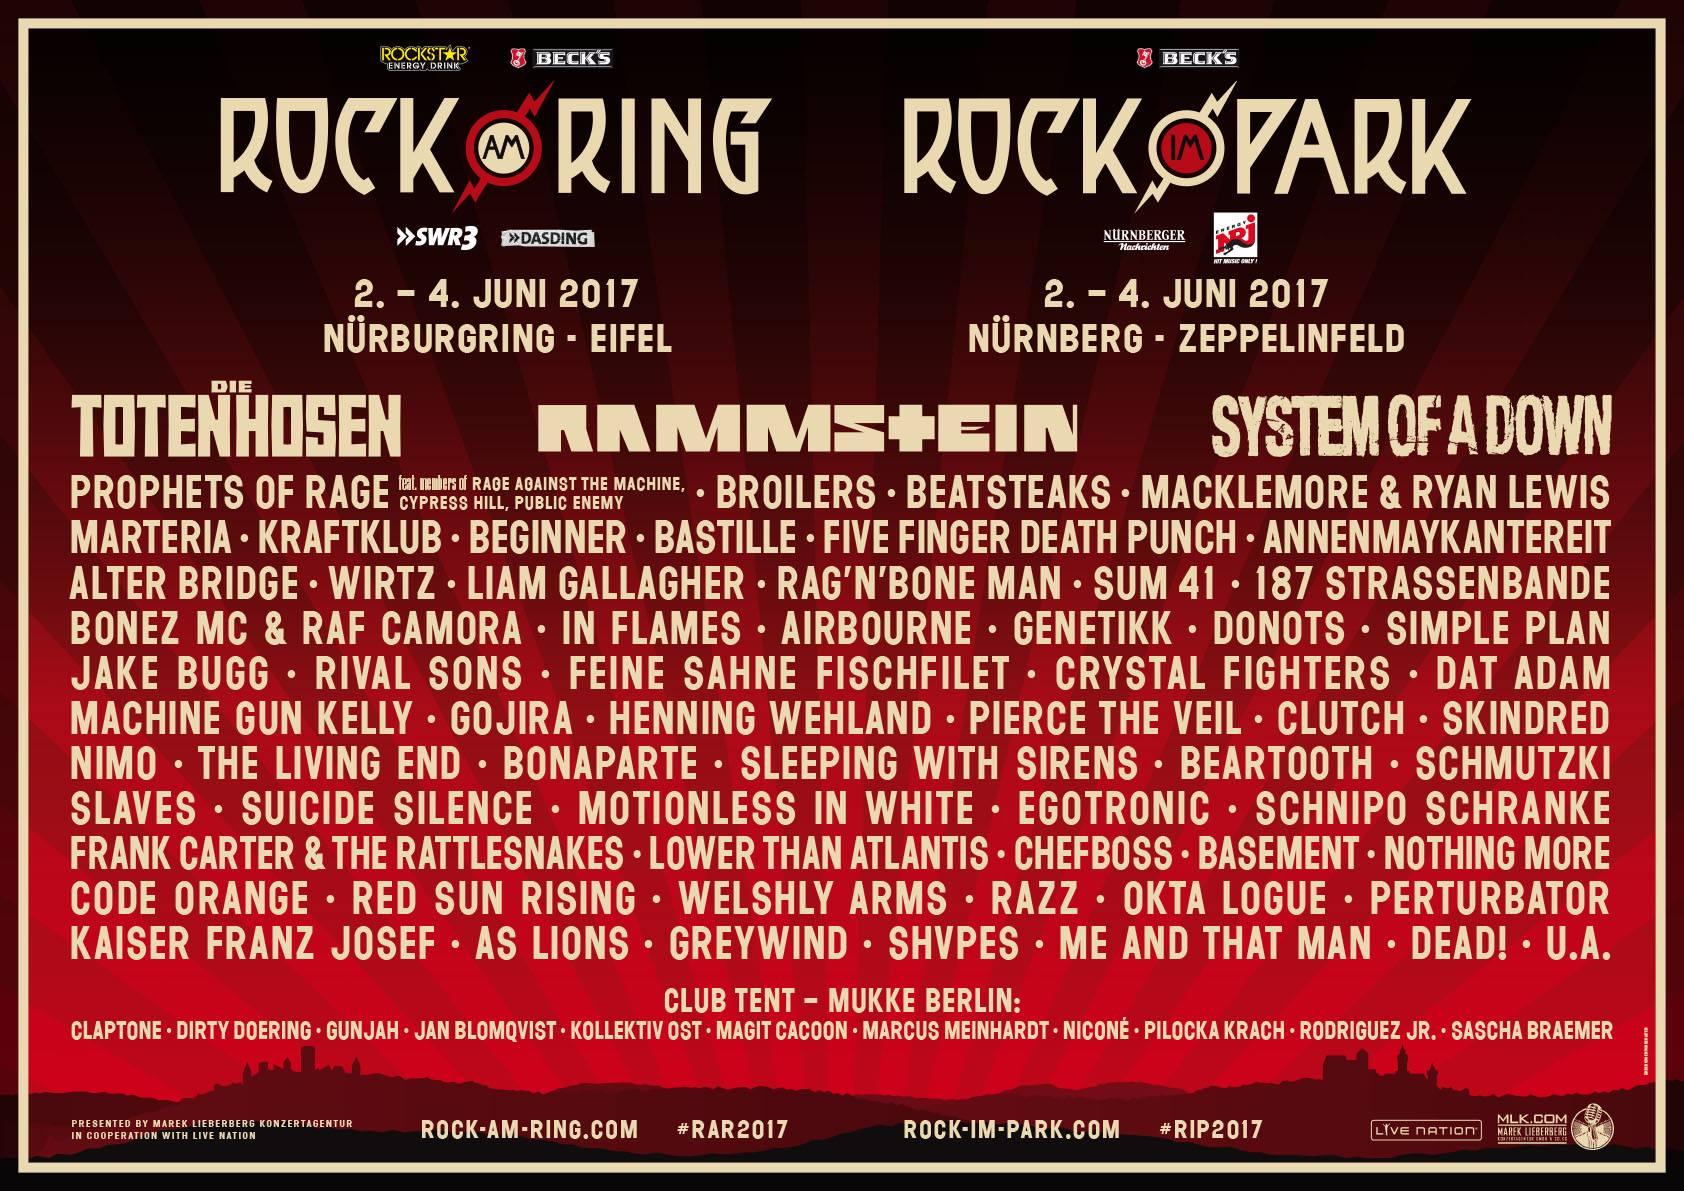 rock am ring rock im park - Rock am Ring / Rock im Park 2017